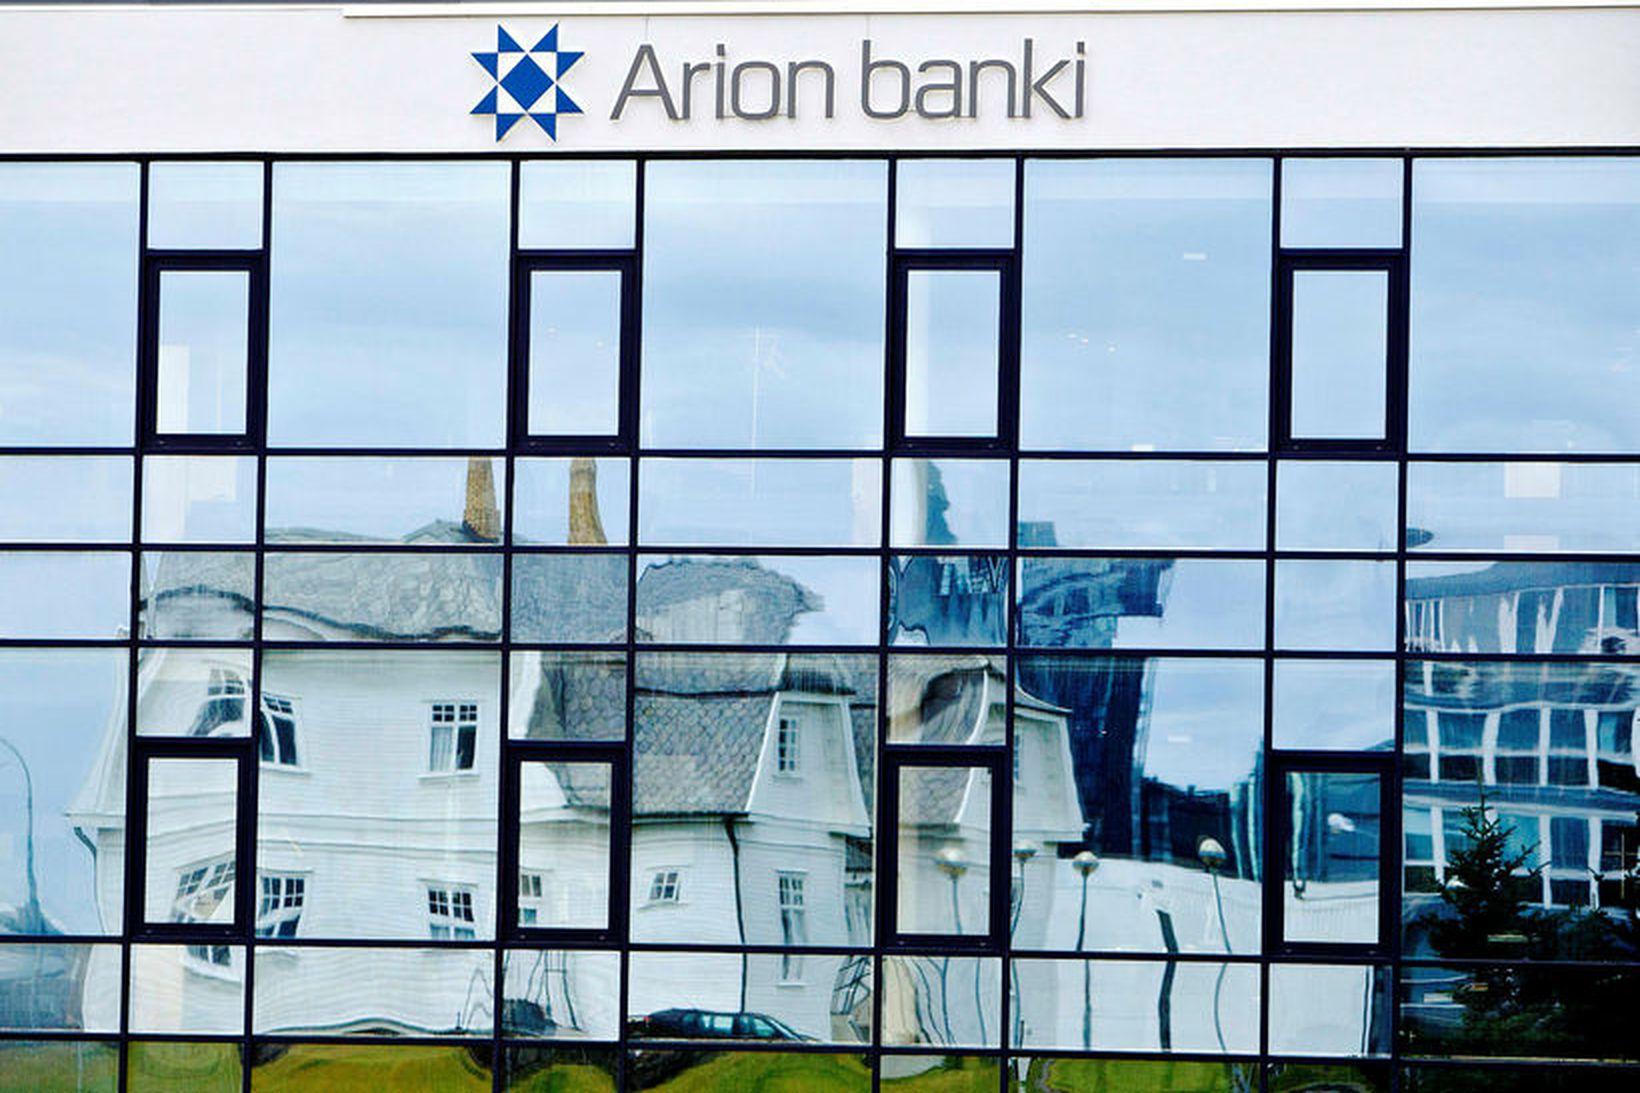 Arion banki.